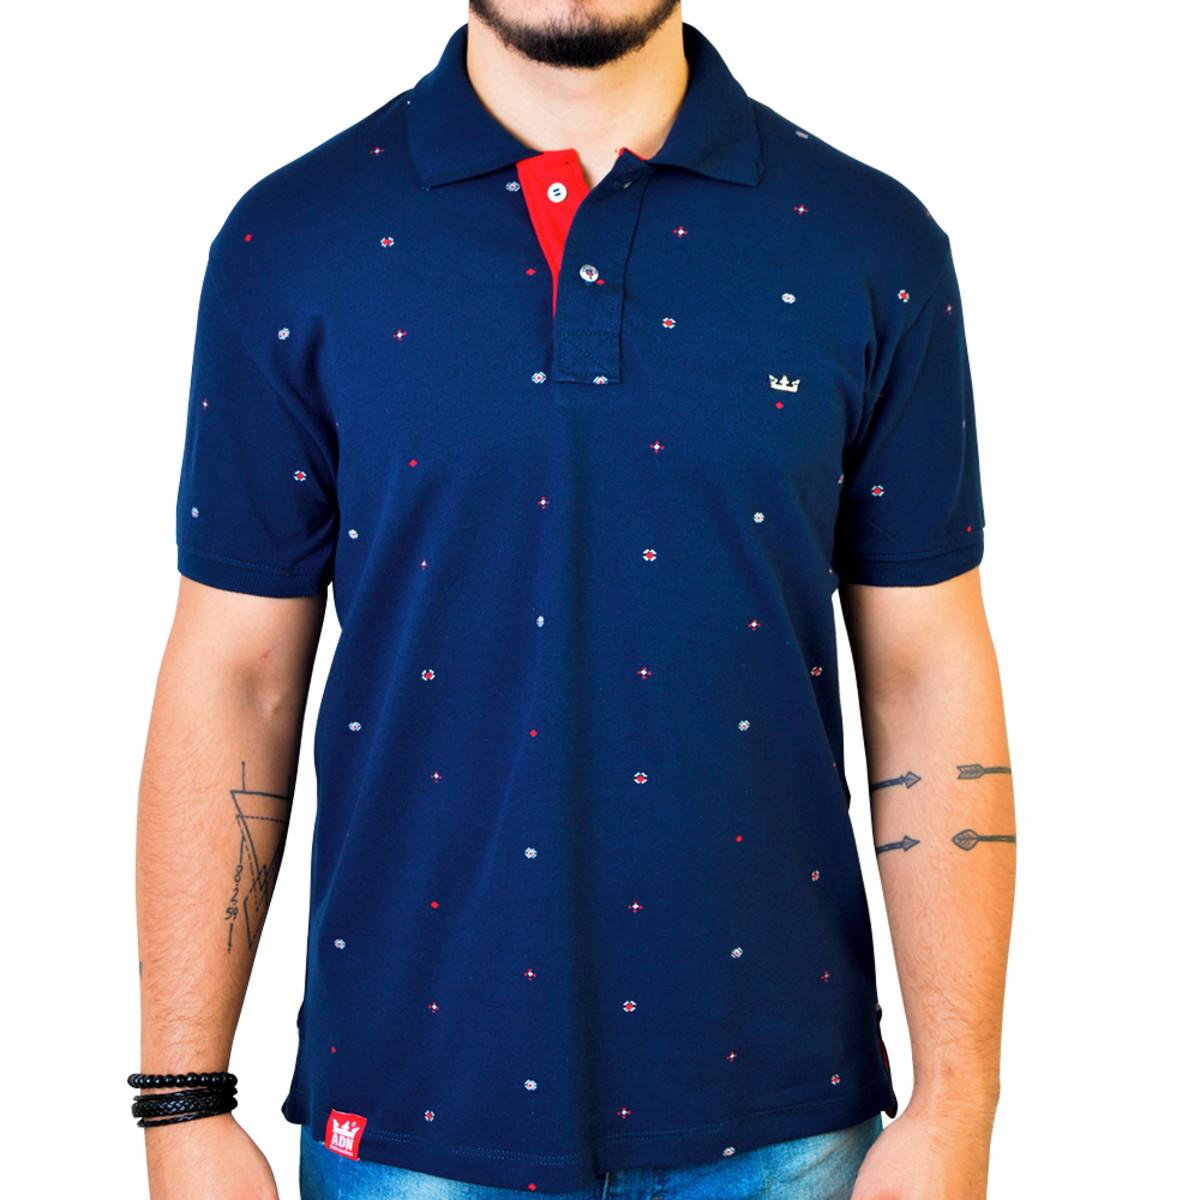 Camisa Polo Adrenalina Azul Marinho no Elo7  6b3345984f052